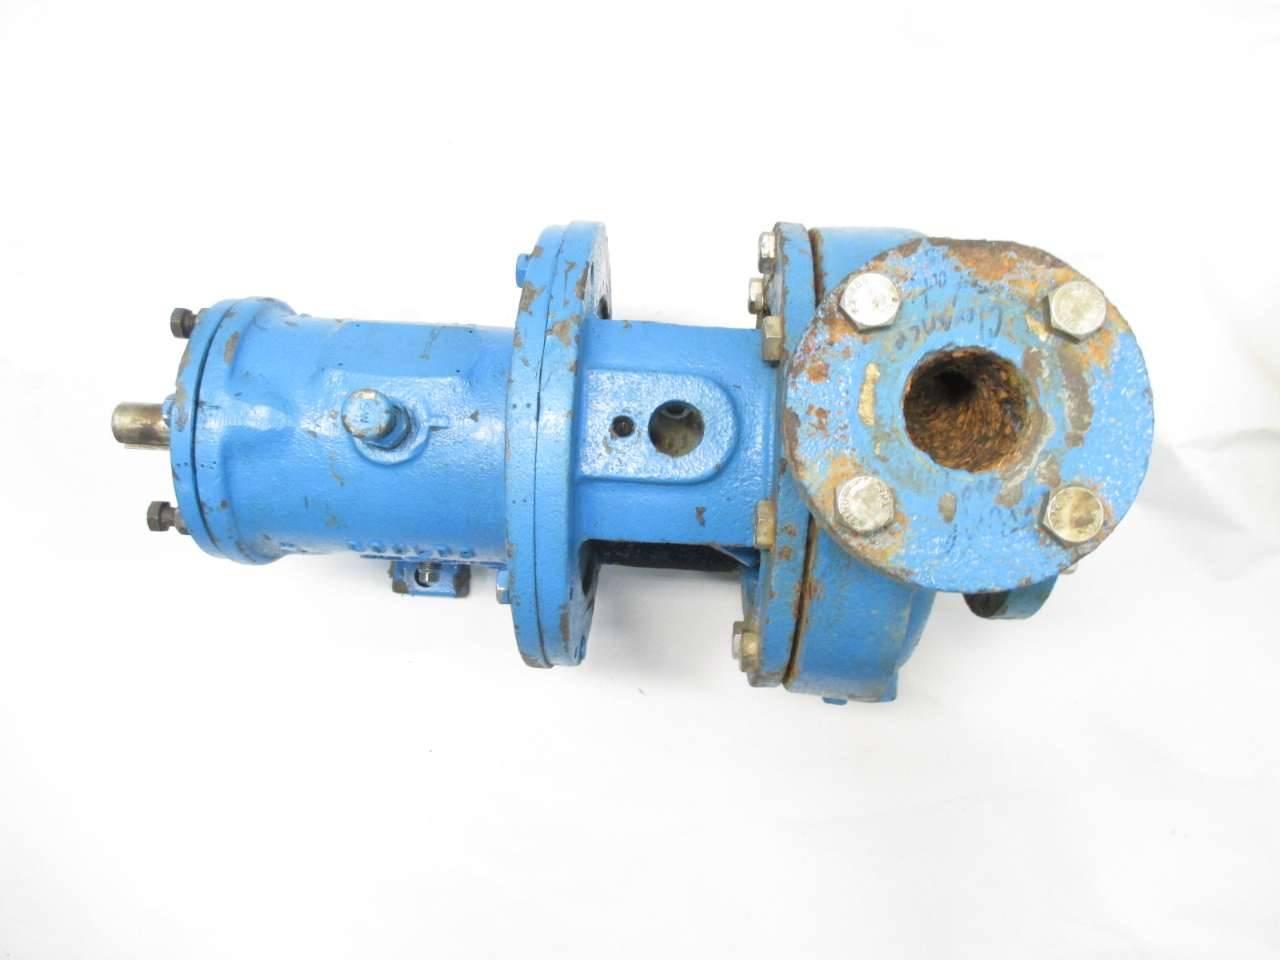 BC-3712WNG by Shorpioen Box Qty 4,000 3//8X3//4 EPDM Bonded Washer G90 Galvanized